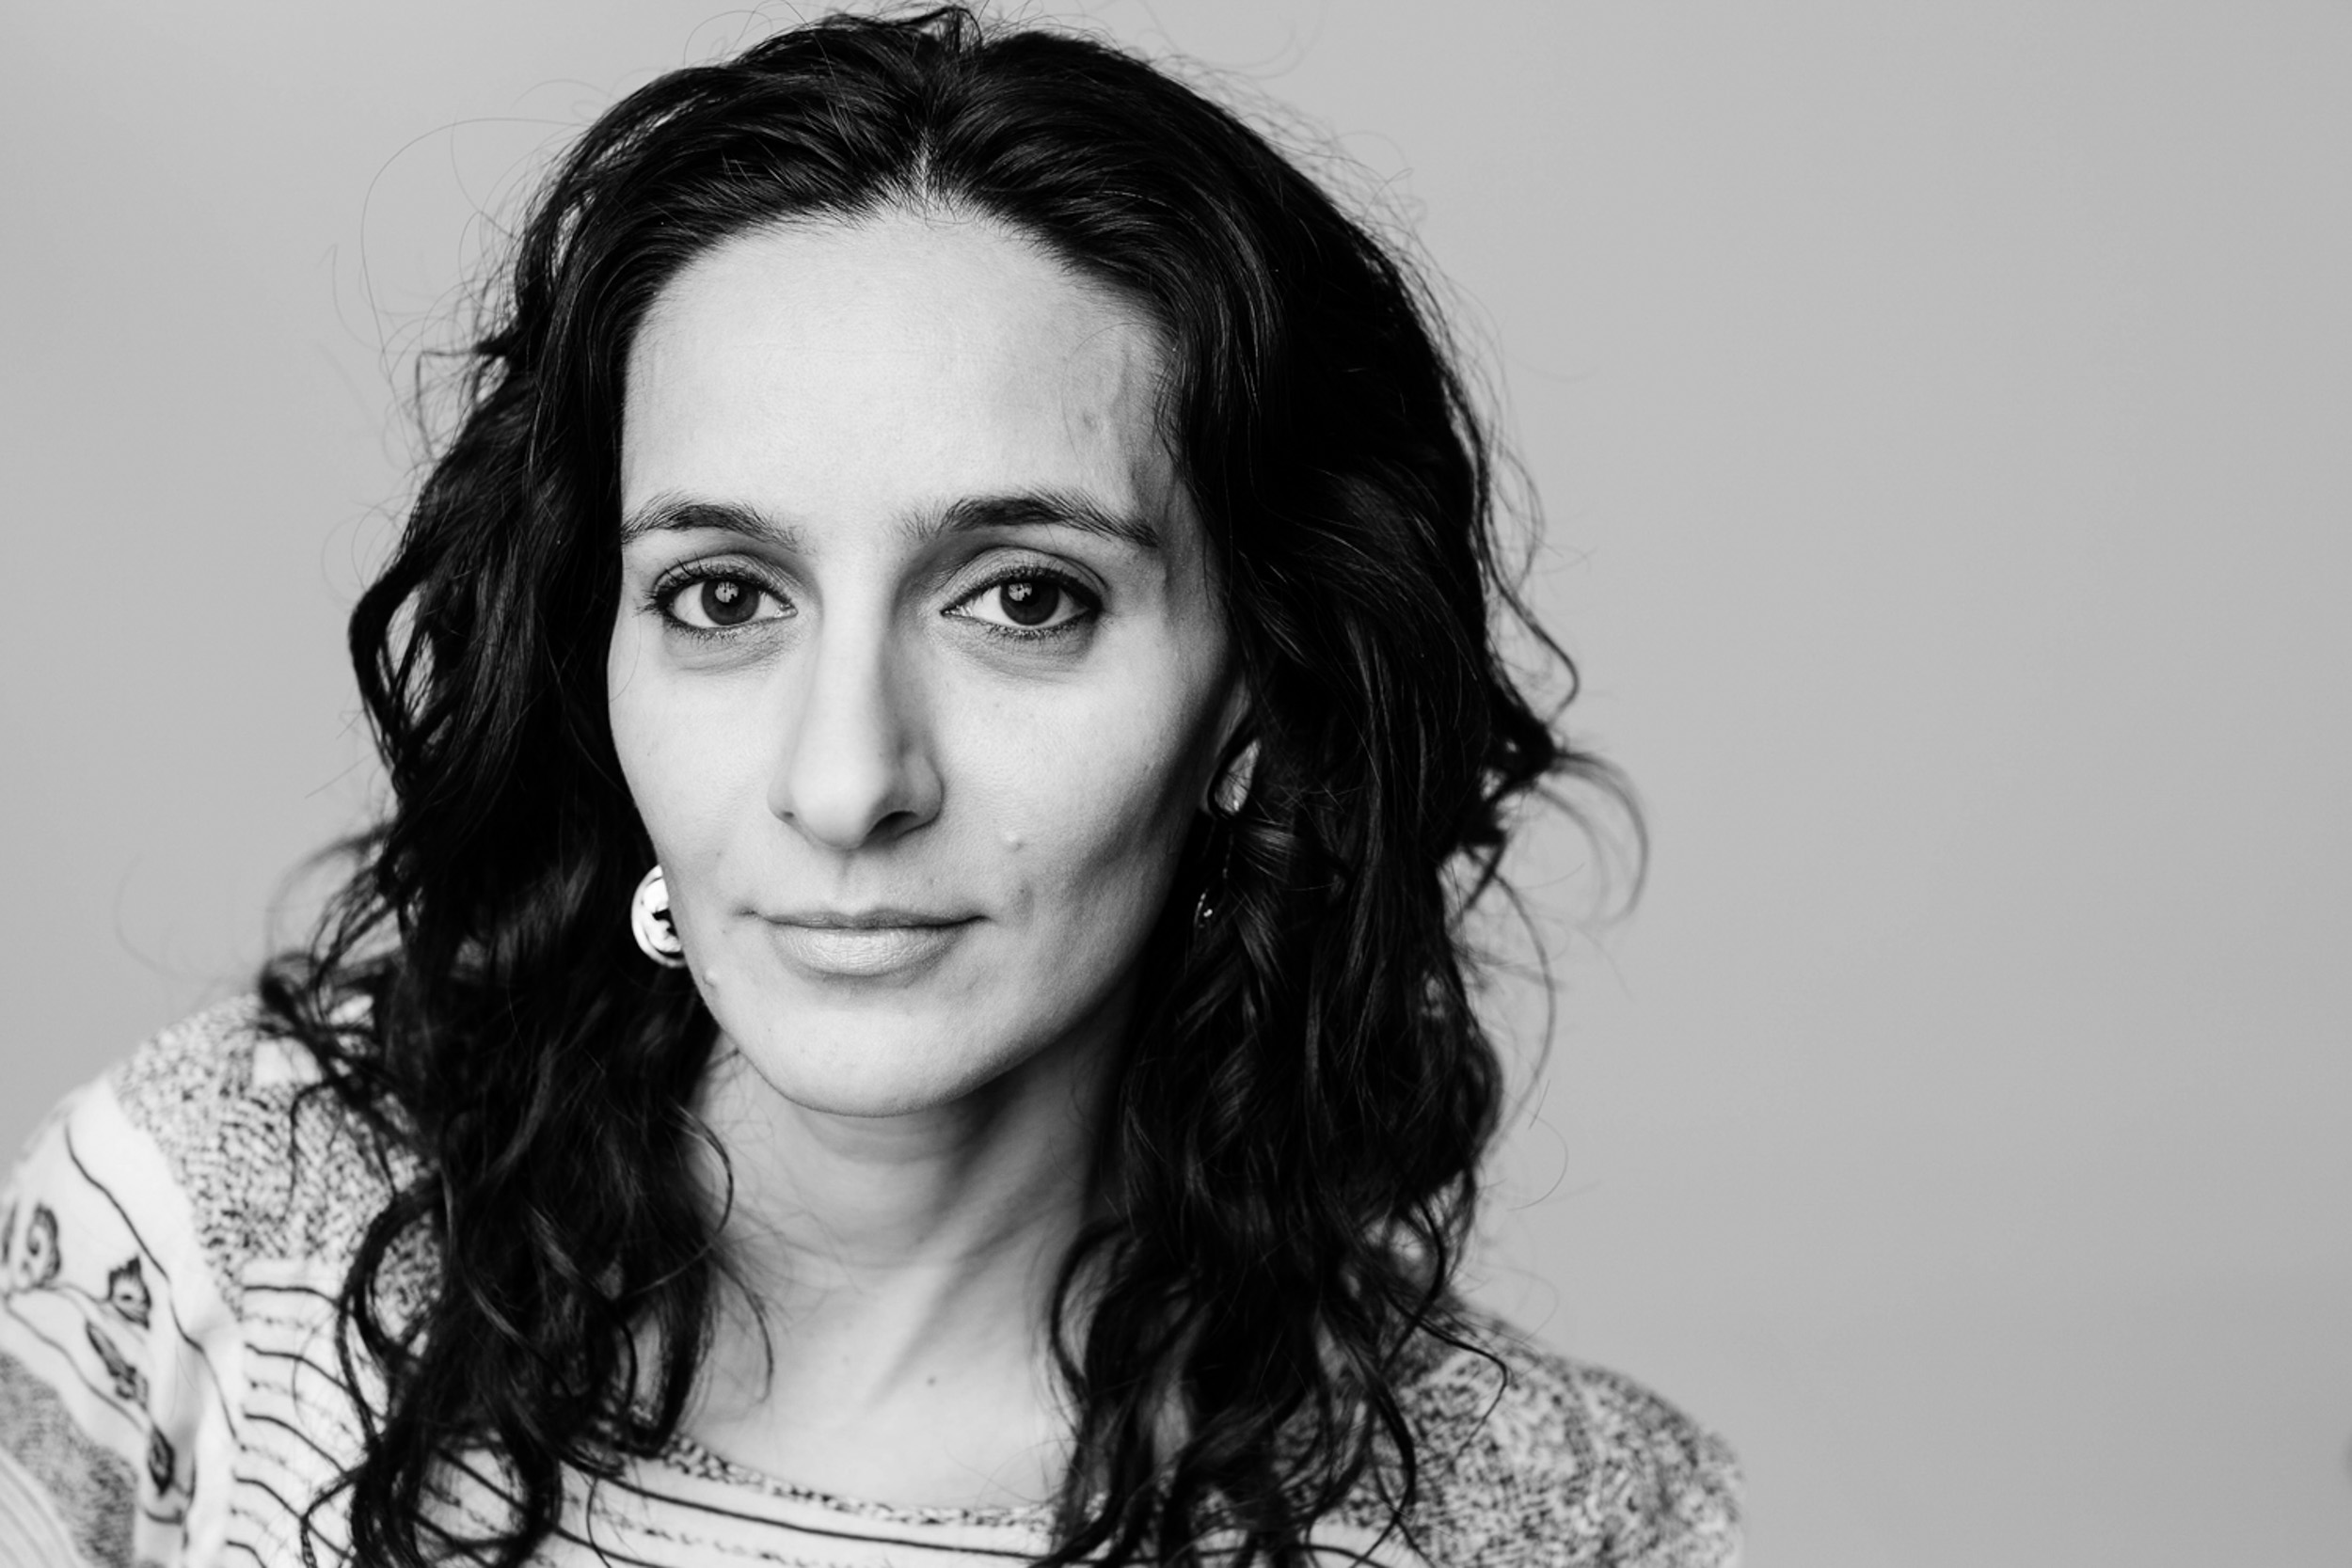 Farah Nosh 2012 (Photograph by David Strongman)